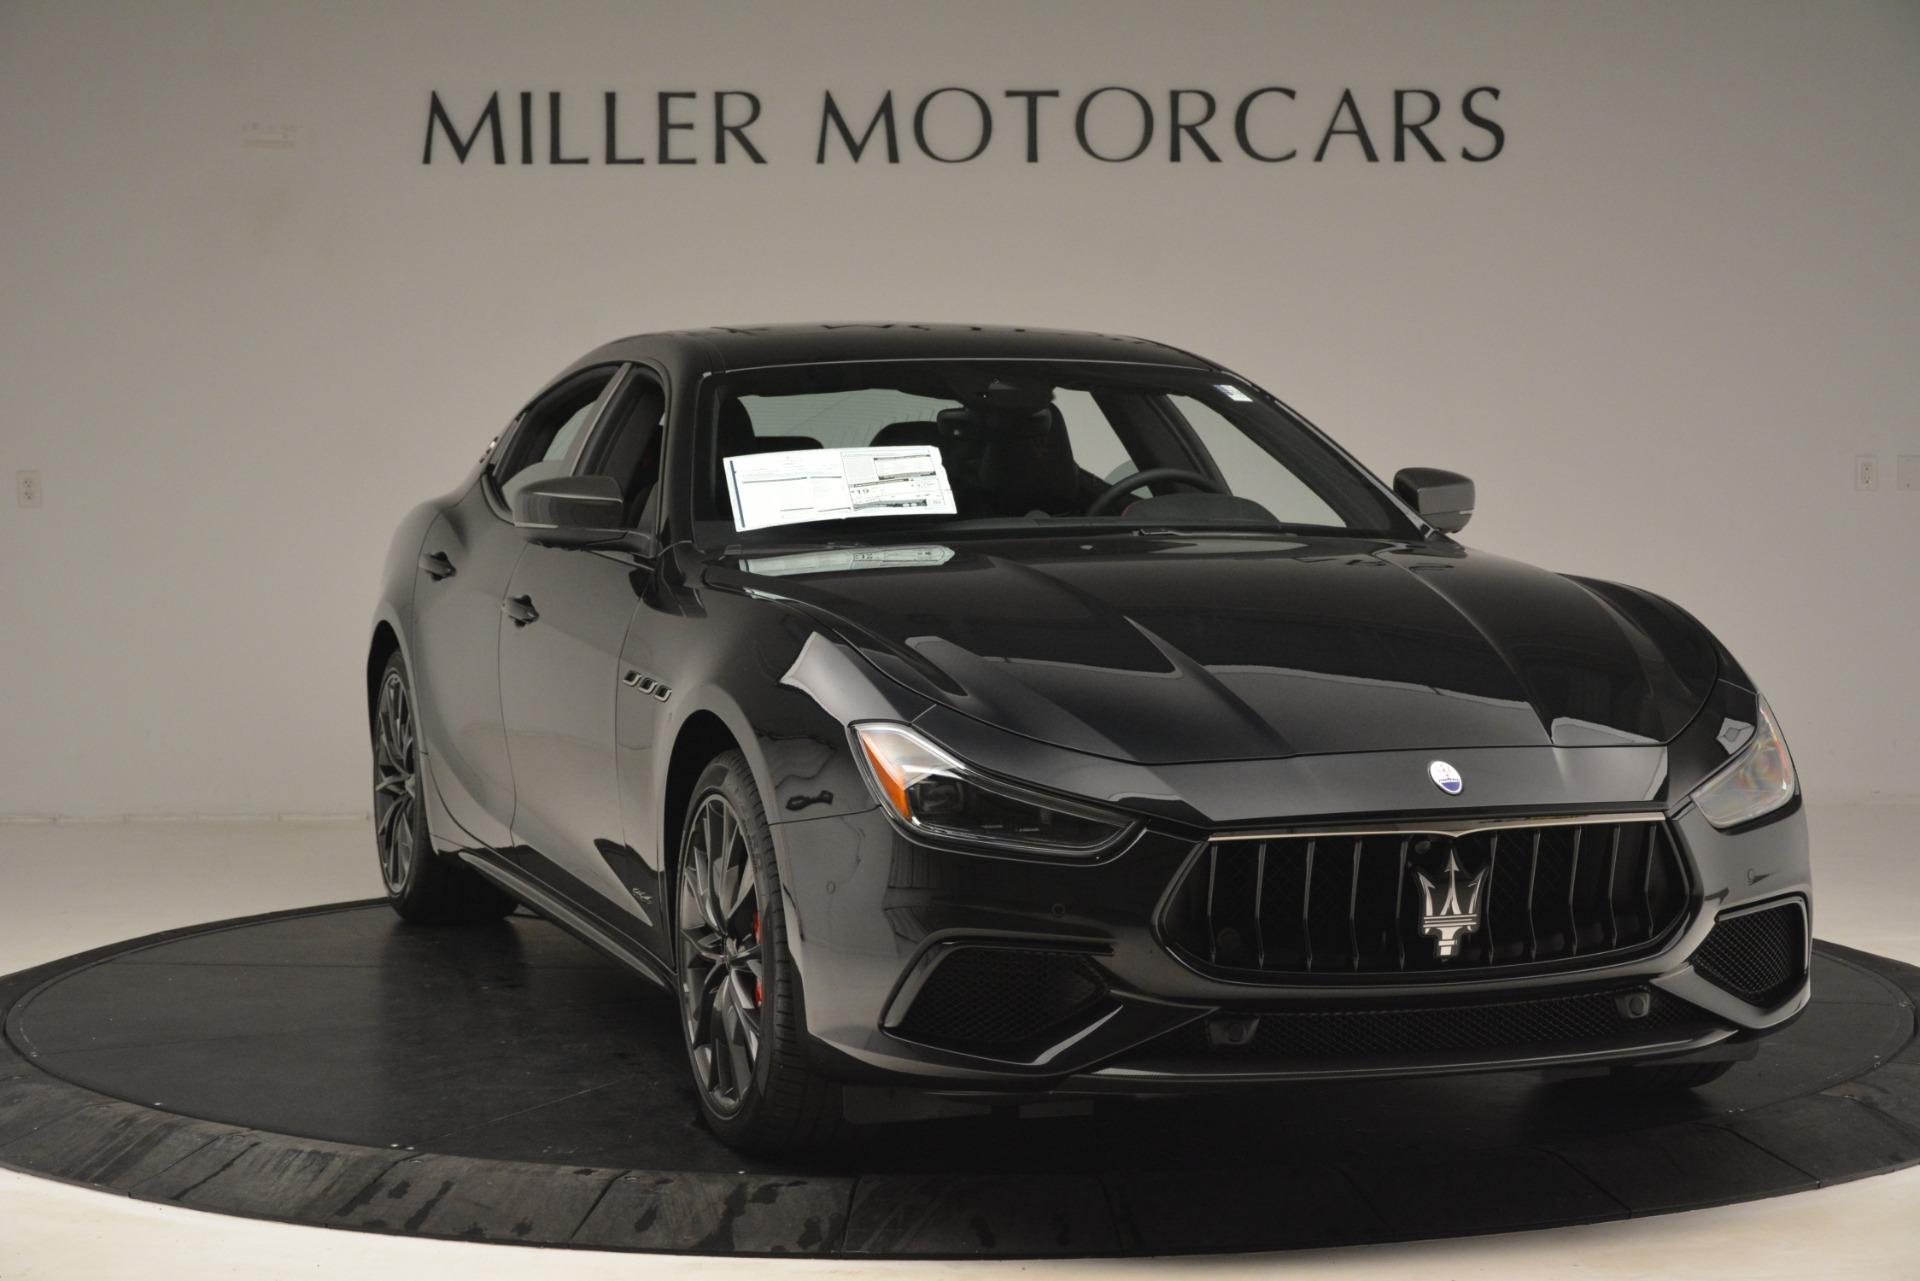 New 2019 Maserati Ghibli S Q4 GranSport For Sale In Greenwich, CT 2926_p11